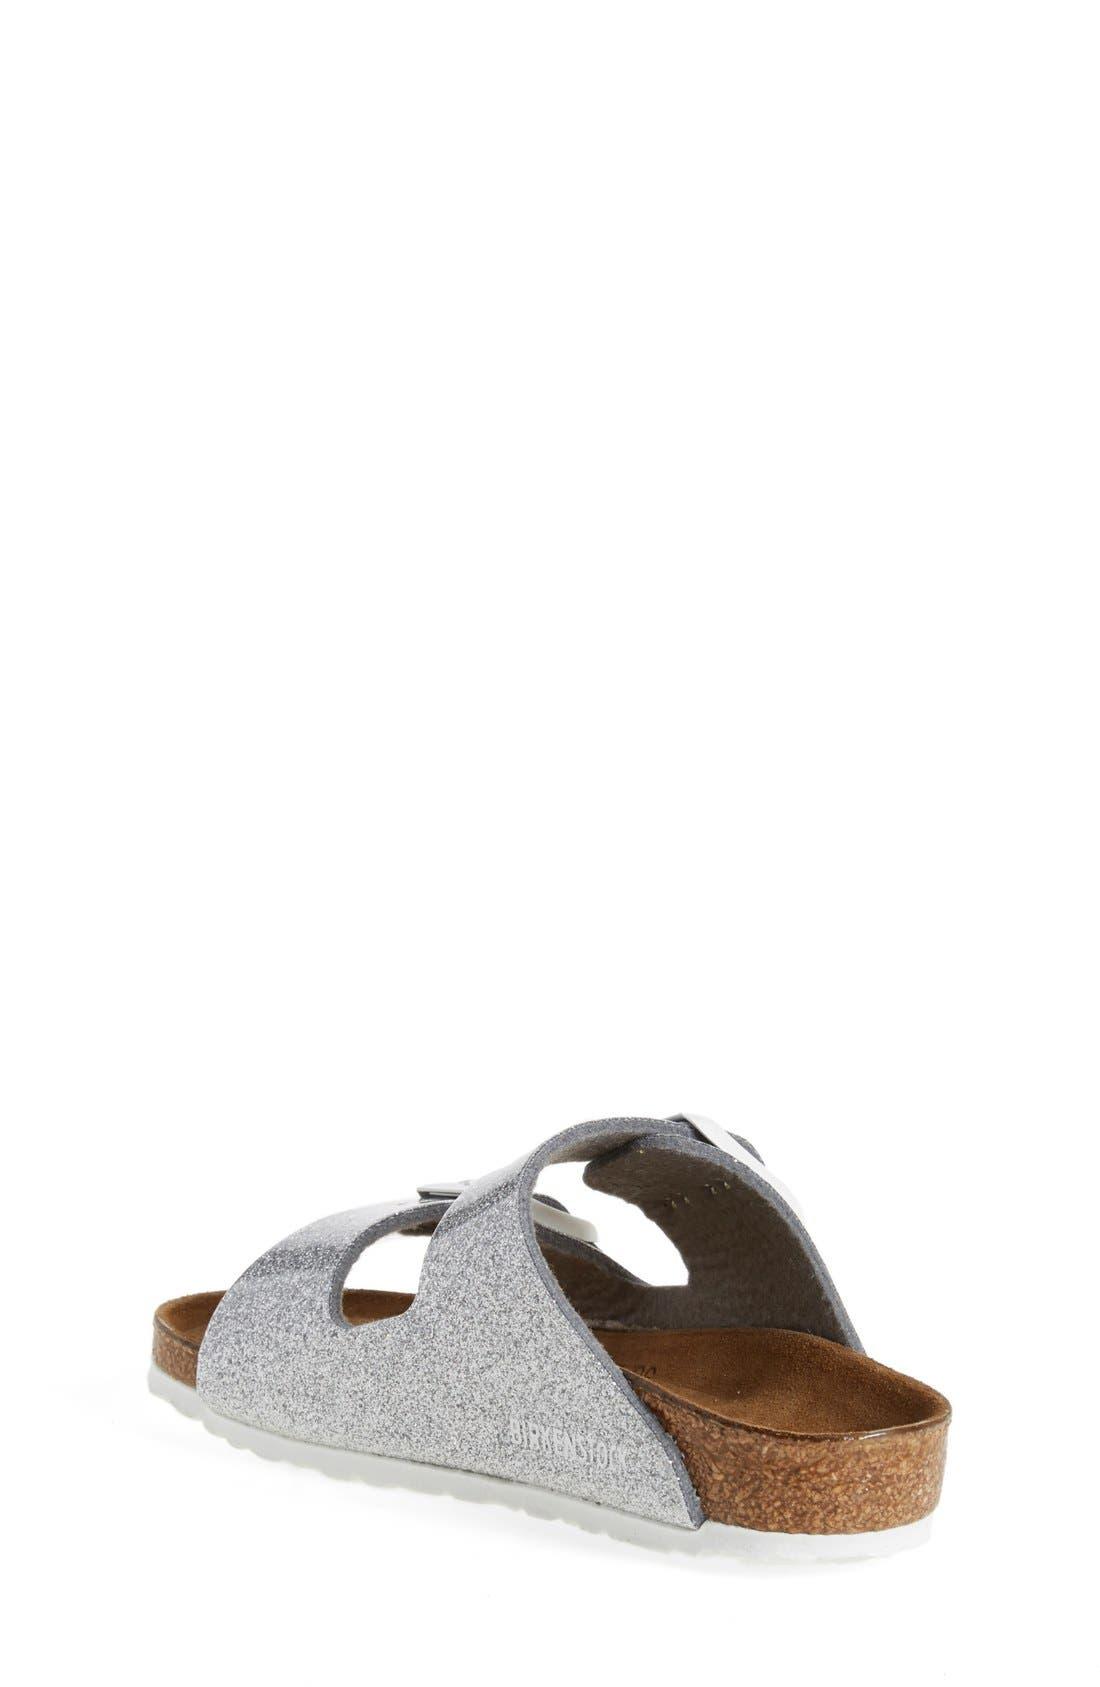 'Arizona Galaxy Birko-Flor' Slide Sandal,                             Alternate thumbnail 6, color,